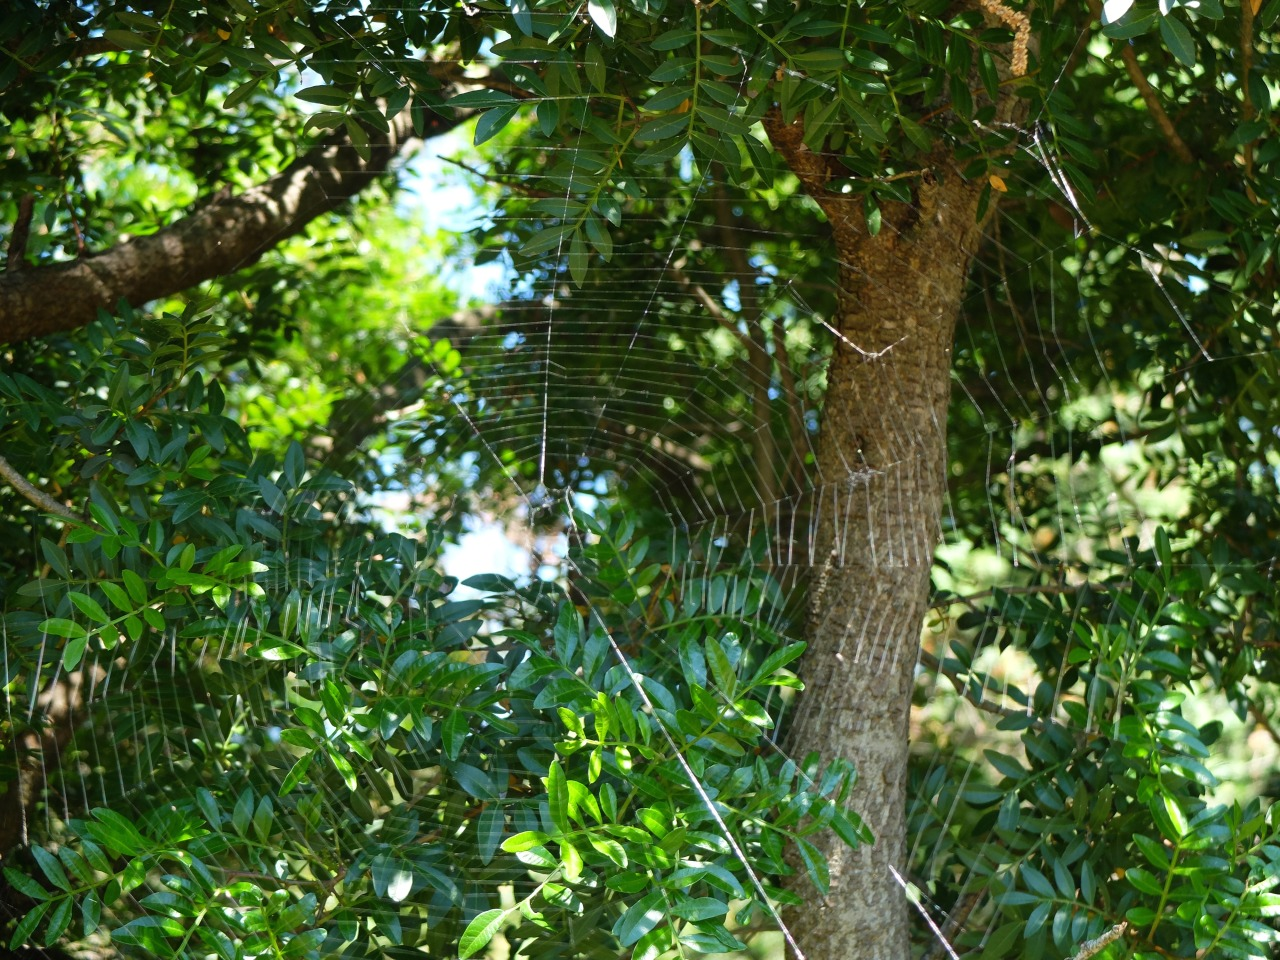 mangia minga - Croatia - of spiders, rocks and caravans